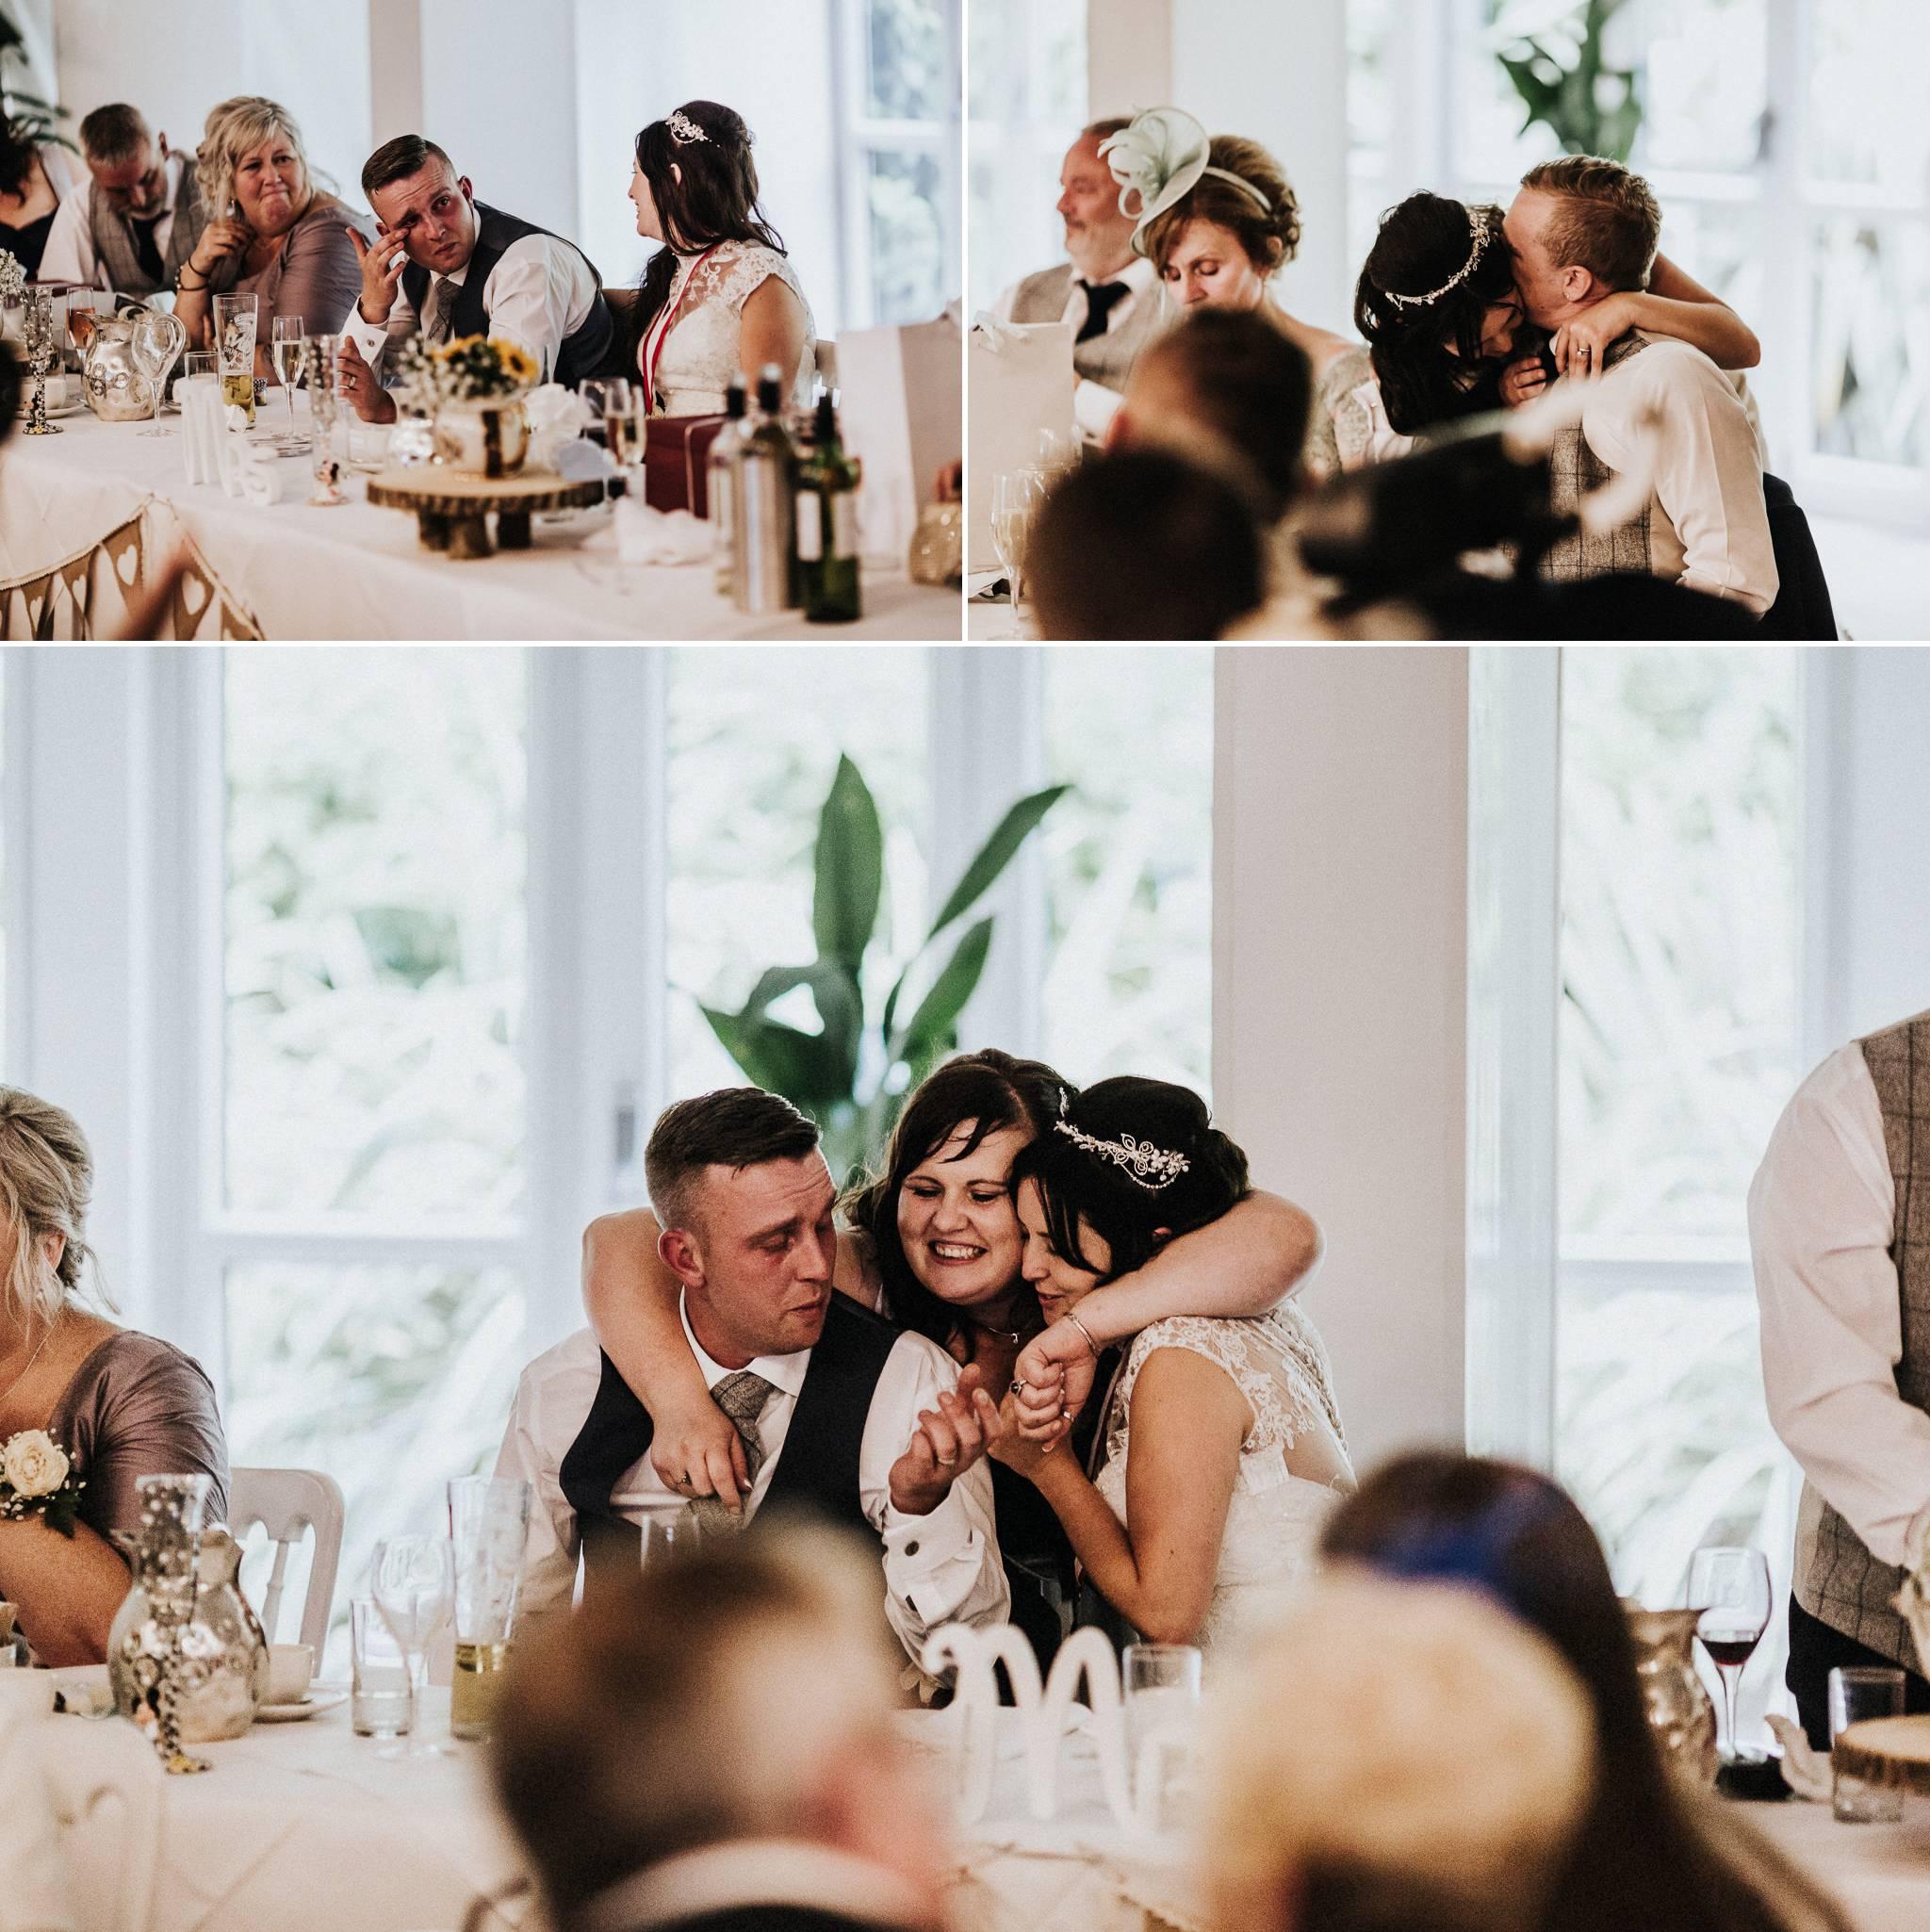 moxhull-hall-wedding-photography 19.jpg